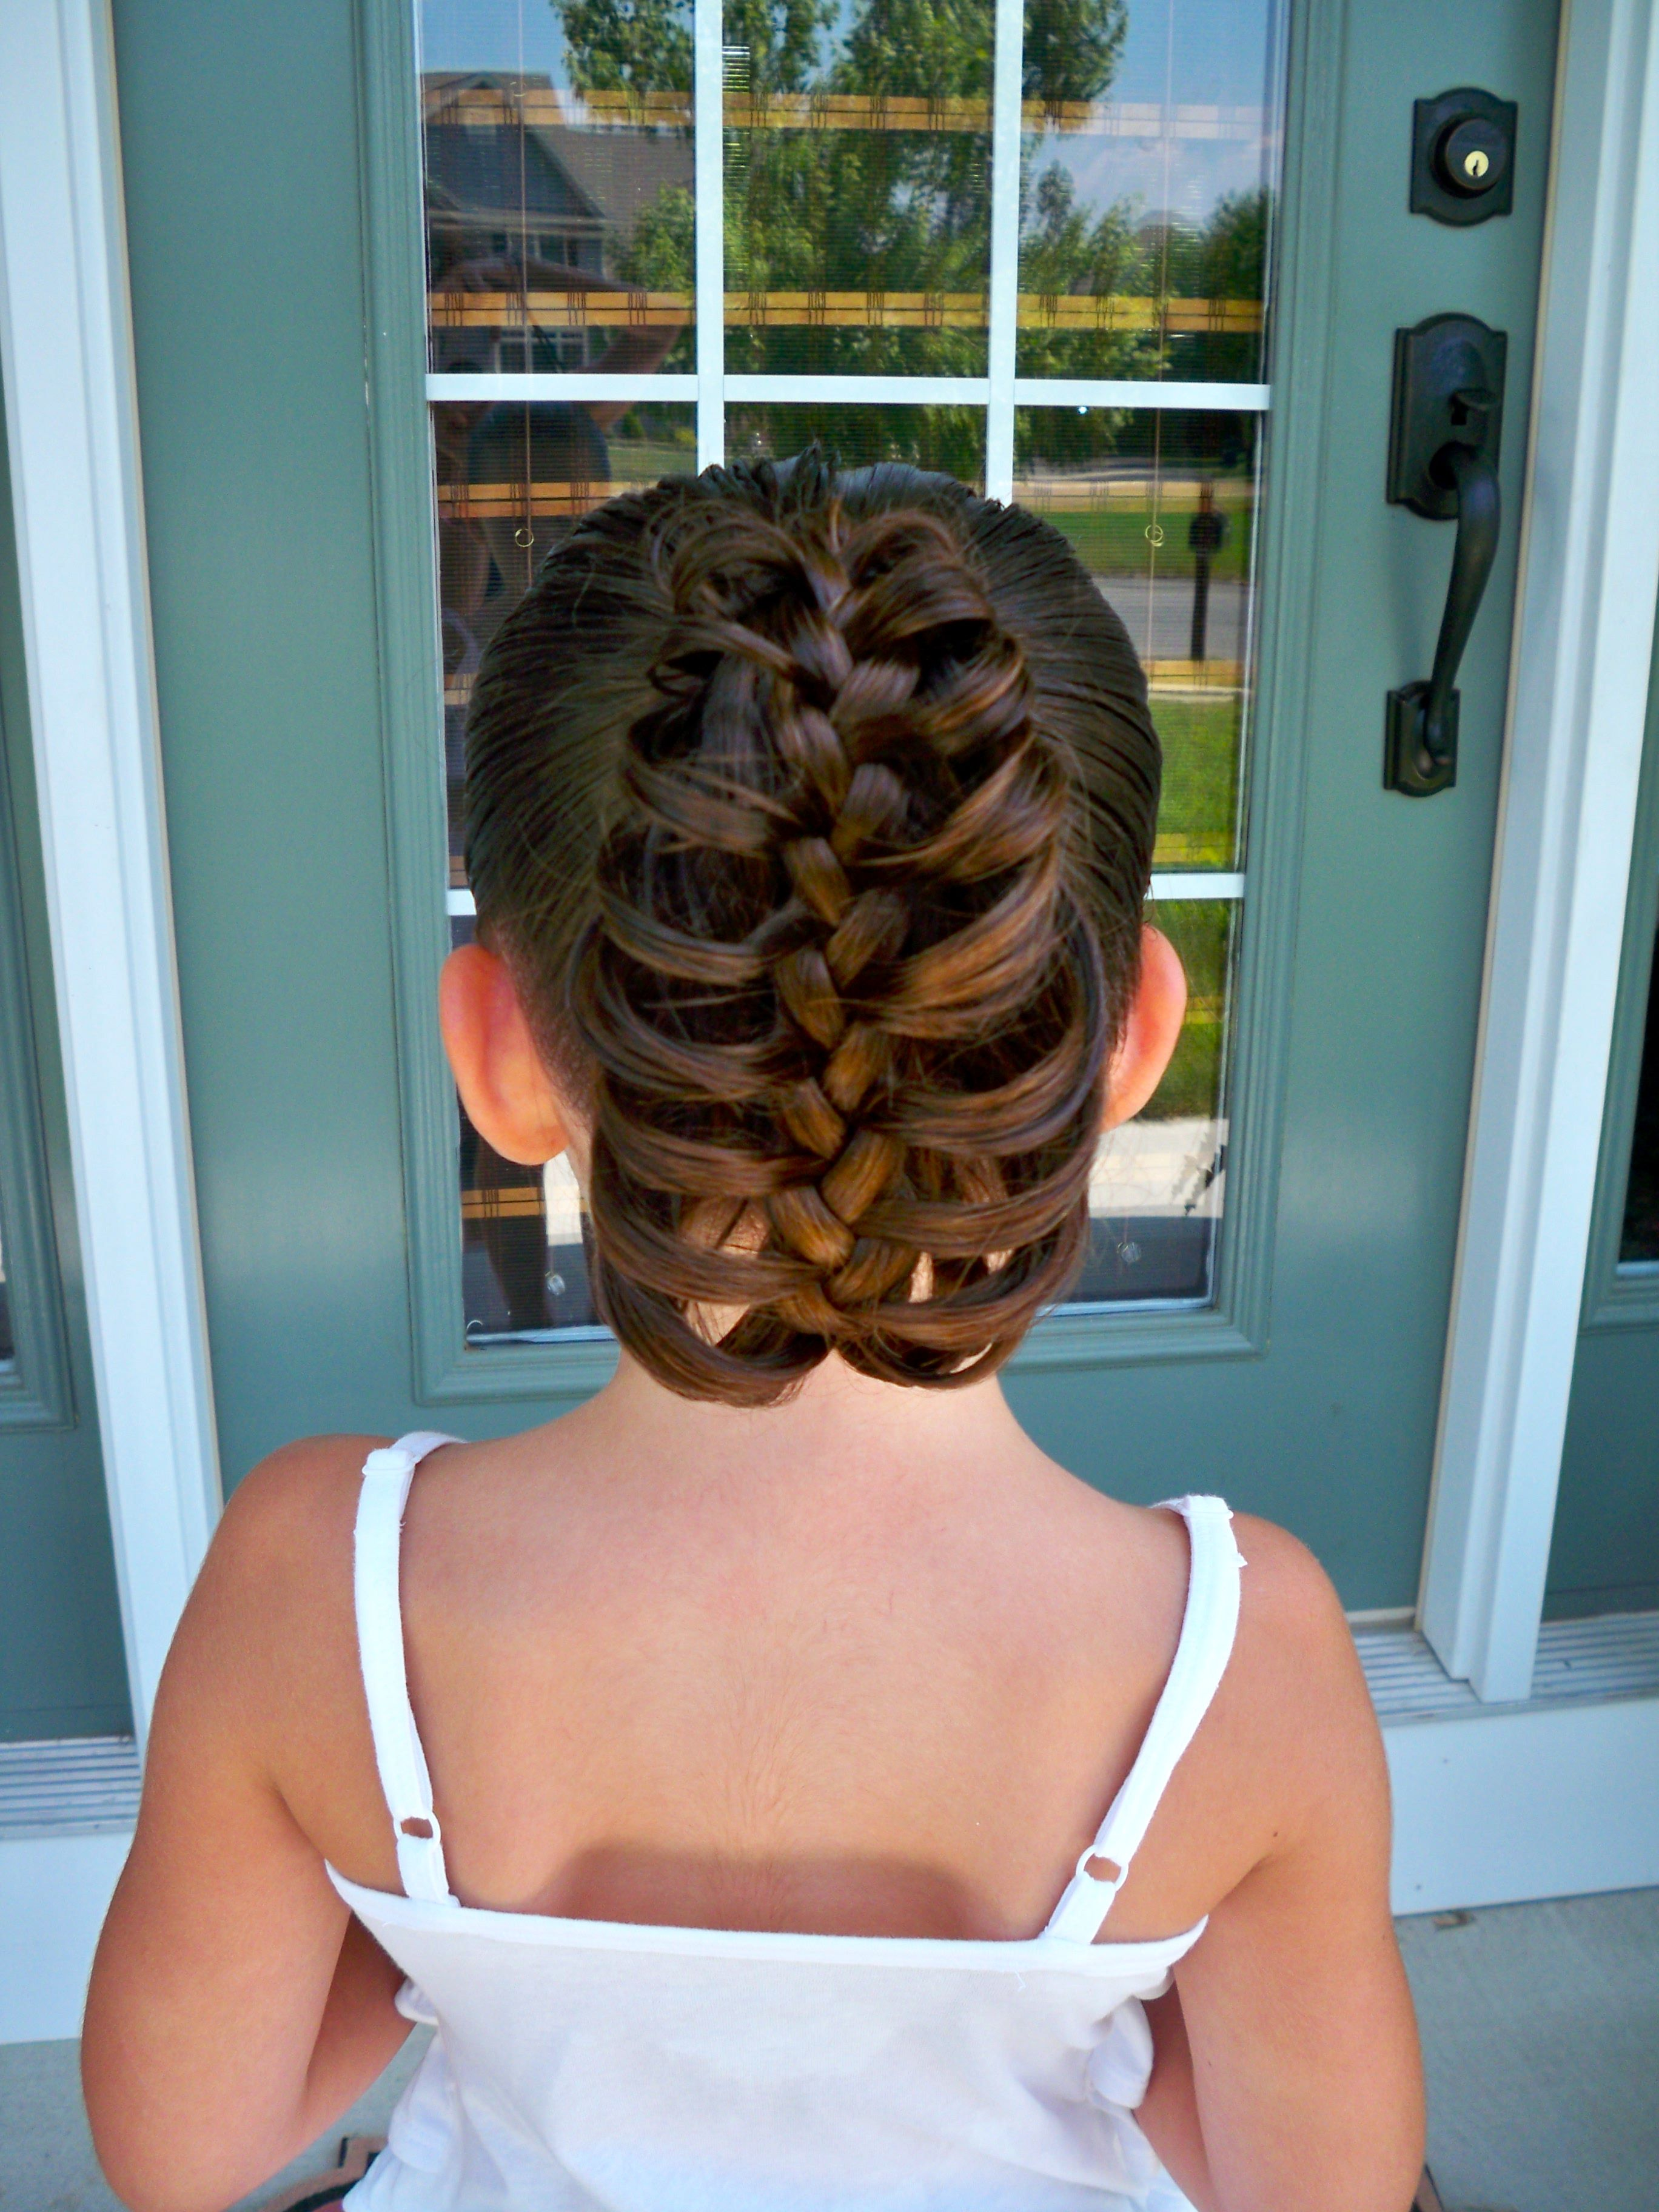 Easy 5 minute hairdo for kids.   Kids hairstyles, Hair styles, Girl haircuts